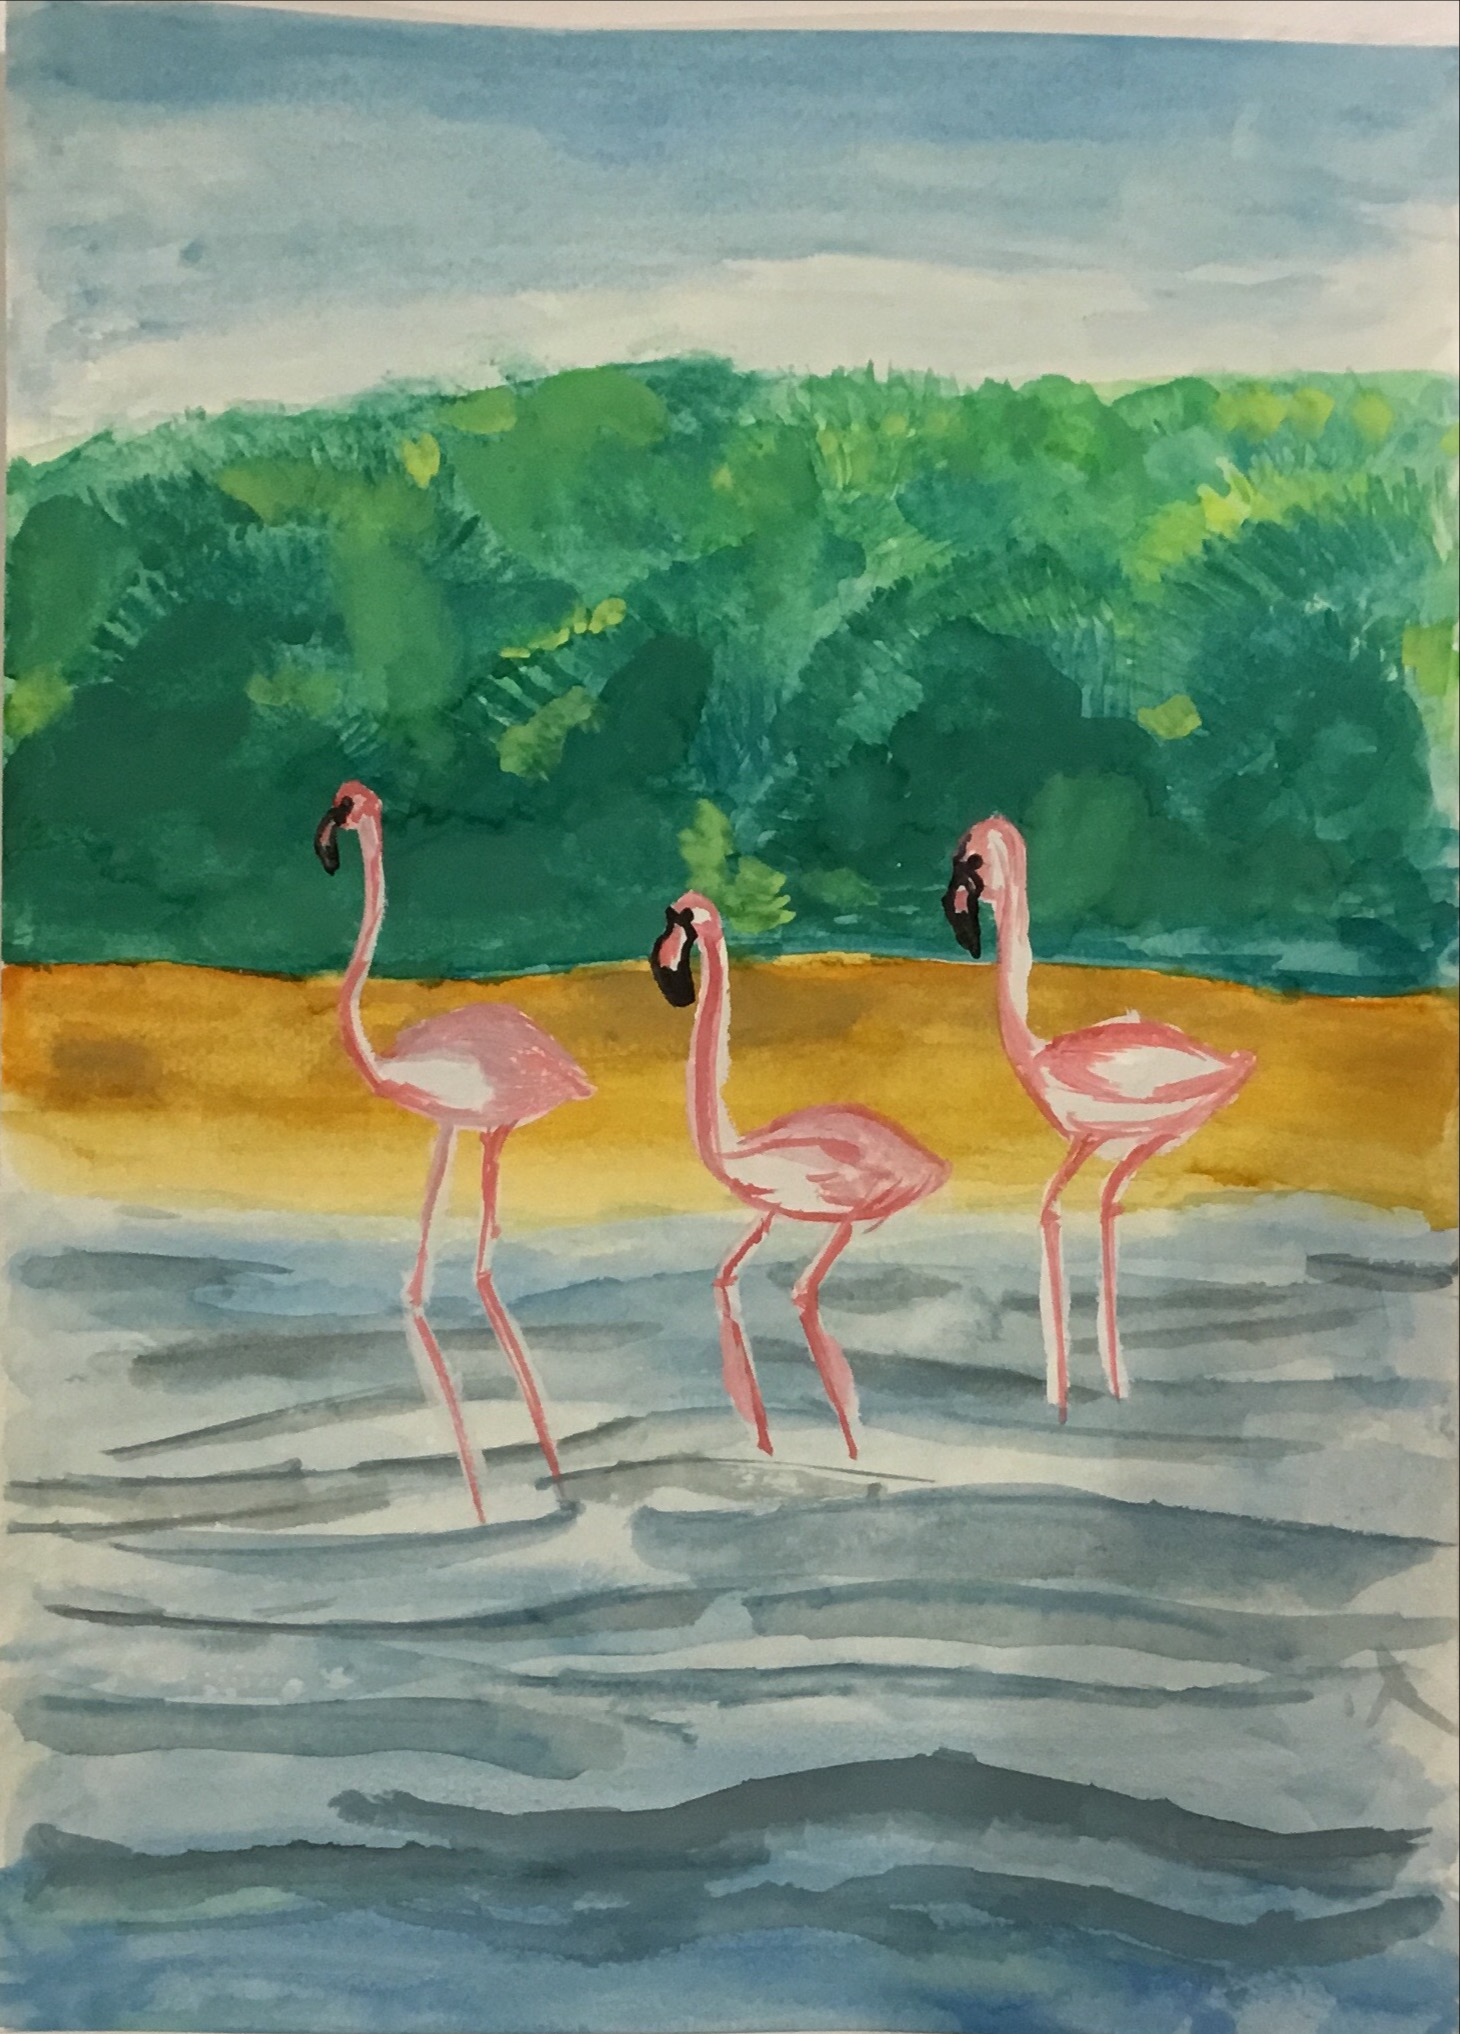 Ras Al Khor Mangroves and Flamingos by Amina Mehek Zohra